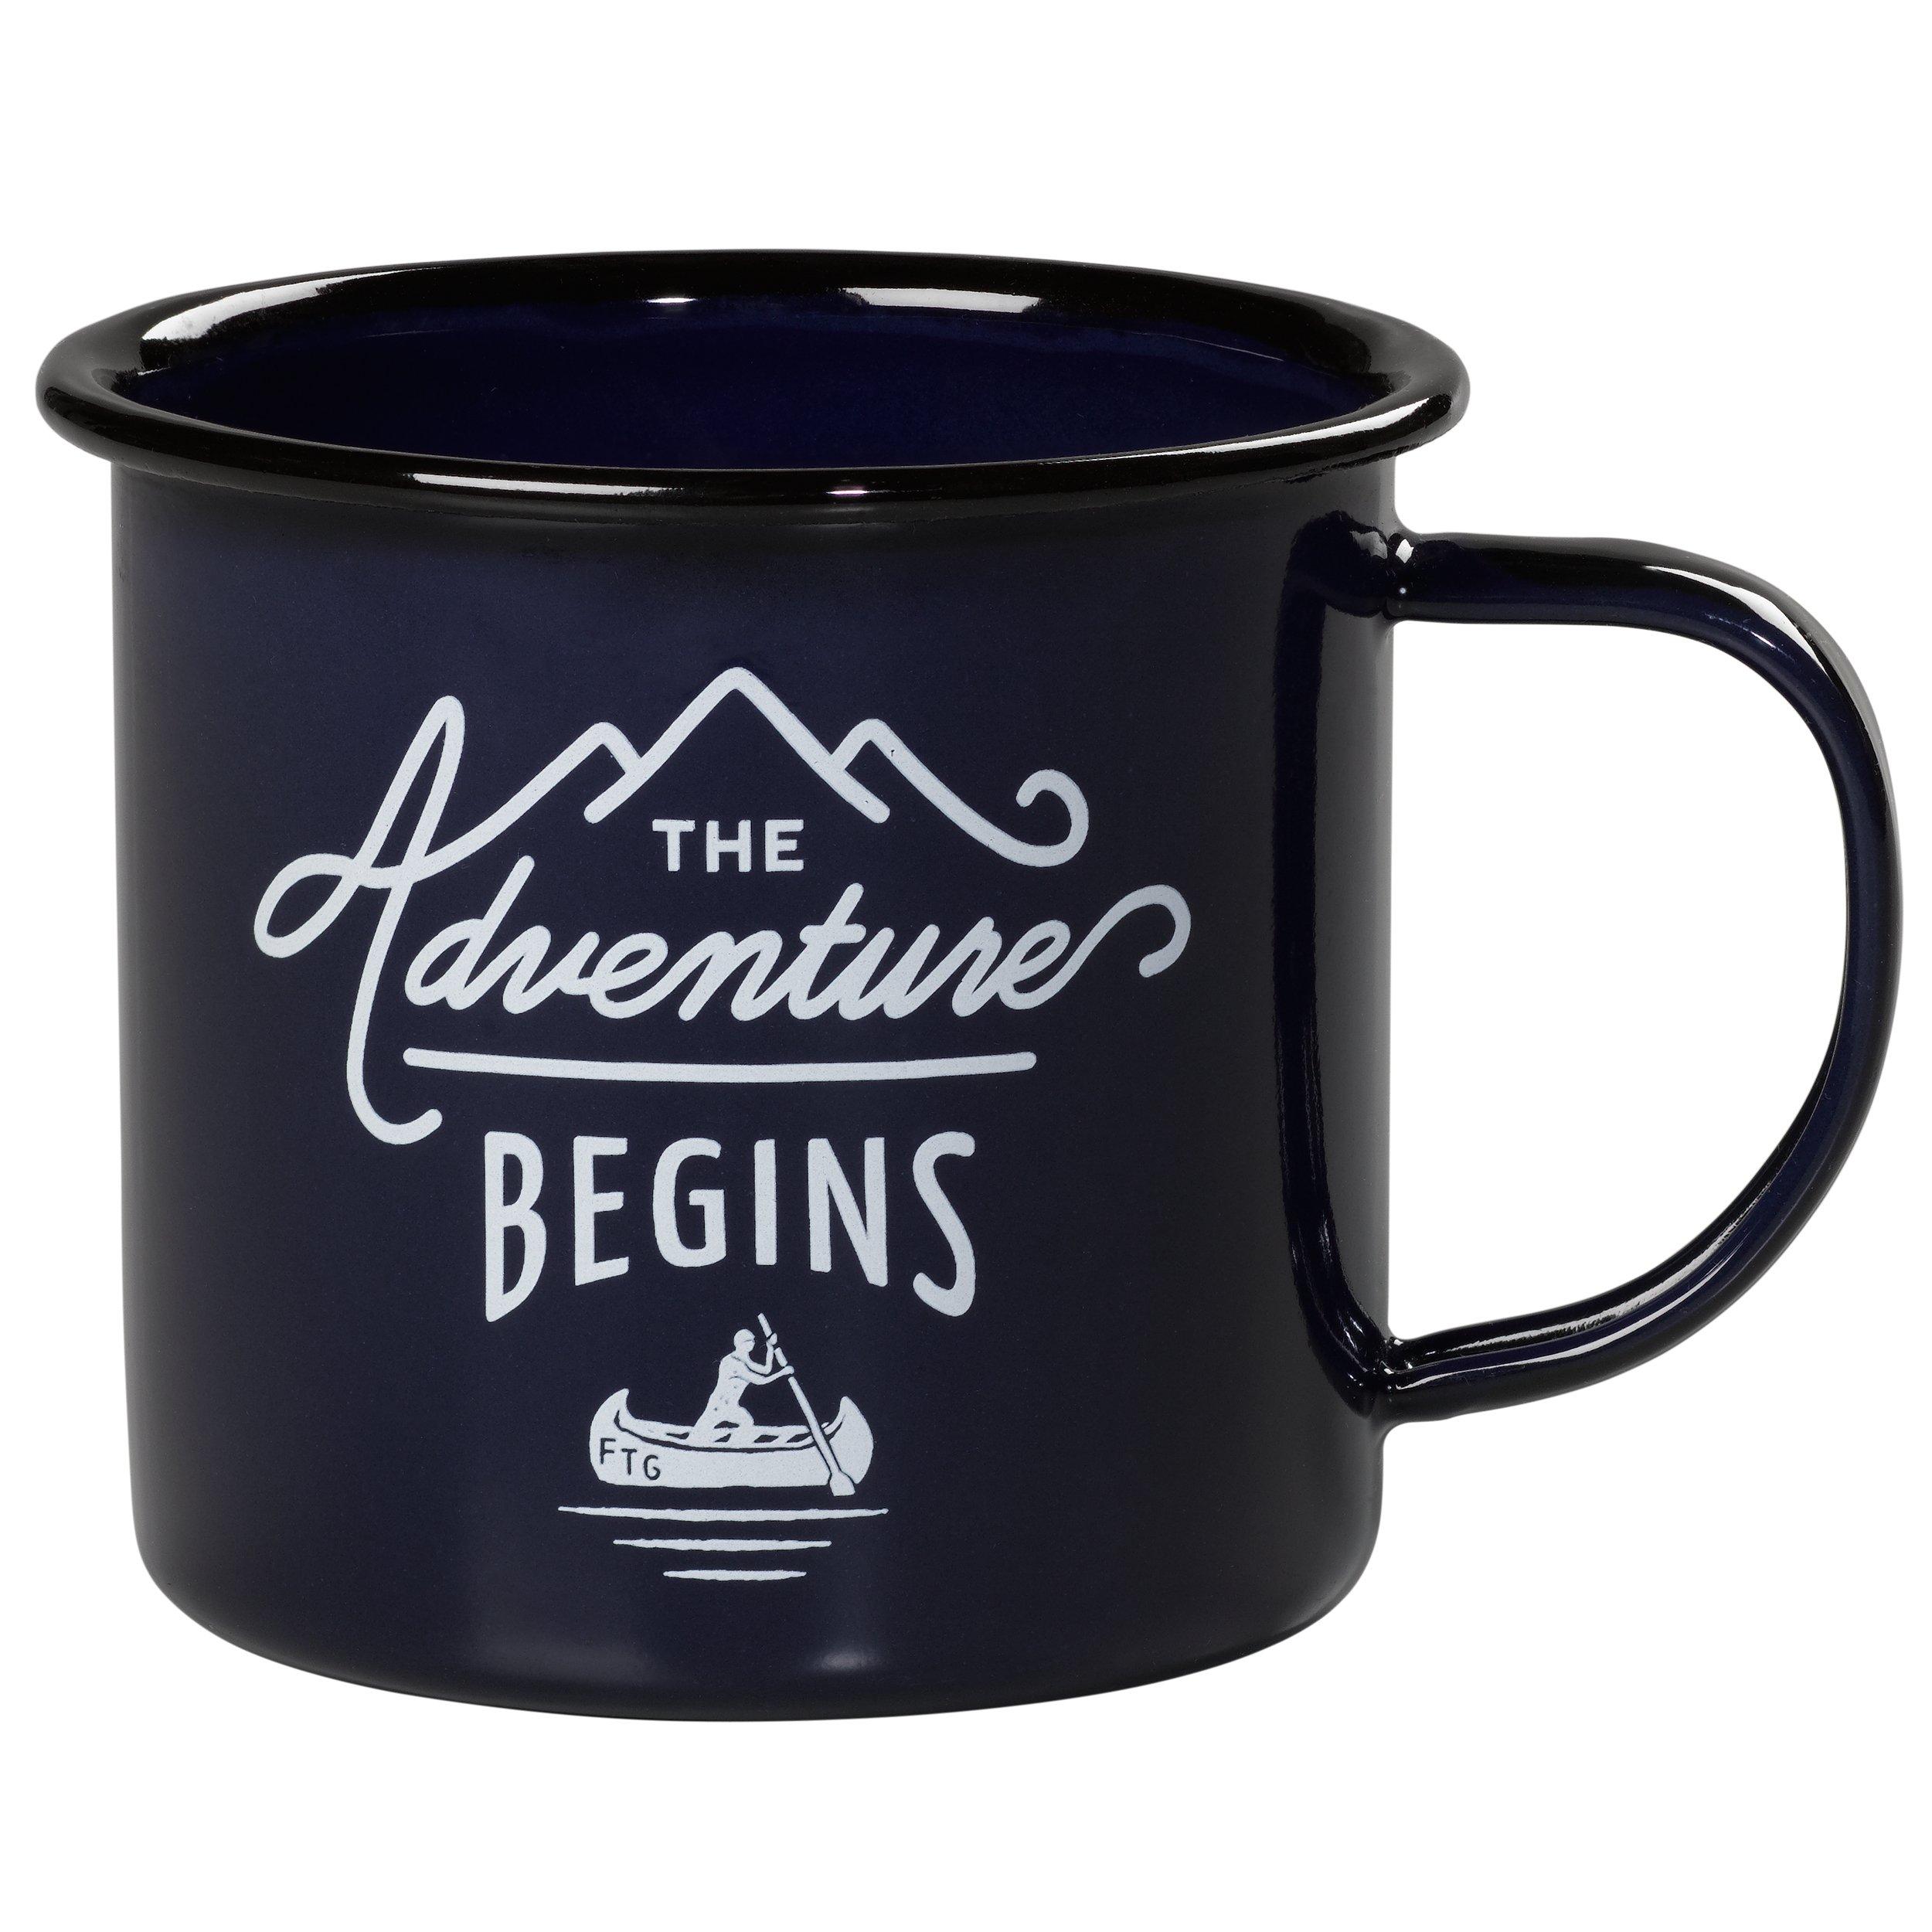 Gentlemen's Hardware Enamel Camping Coffee Mug, Blue (12 Ounces)